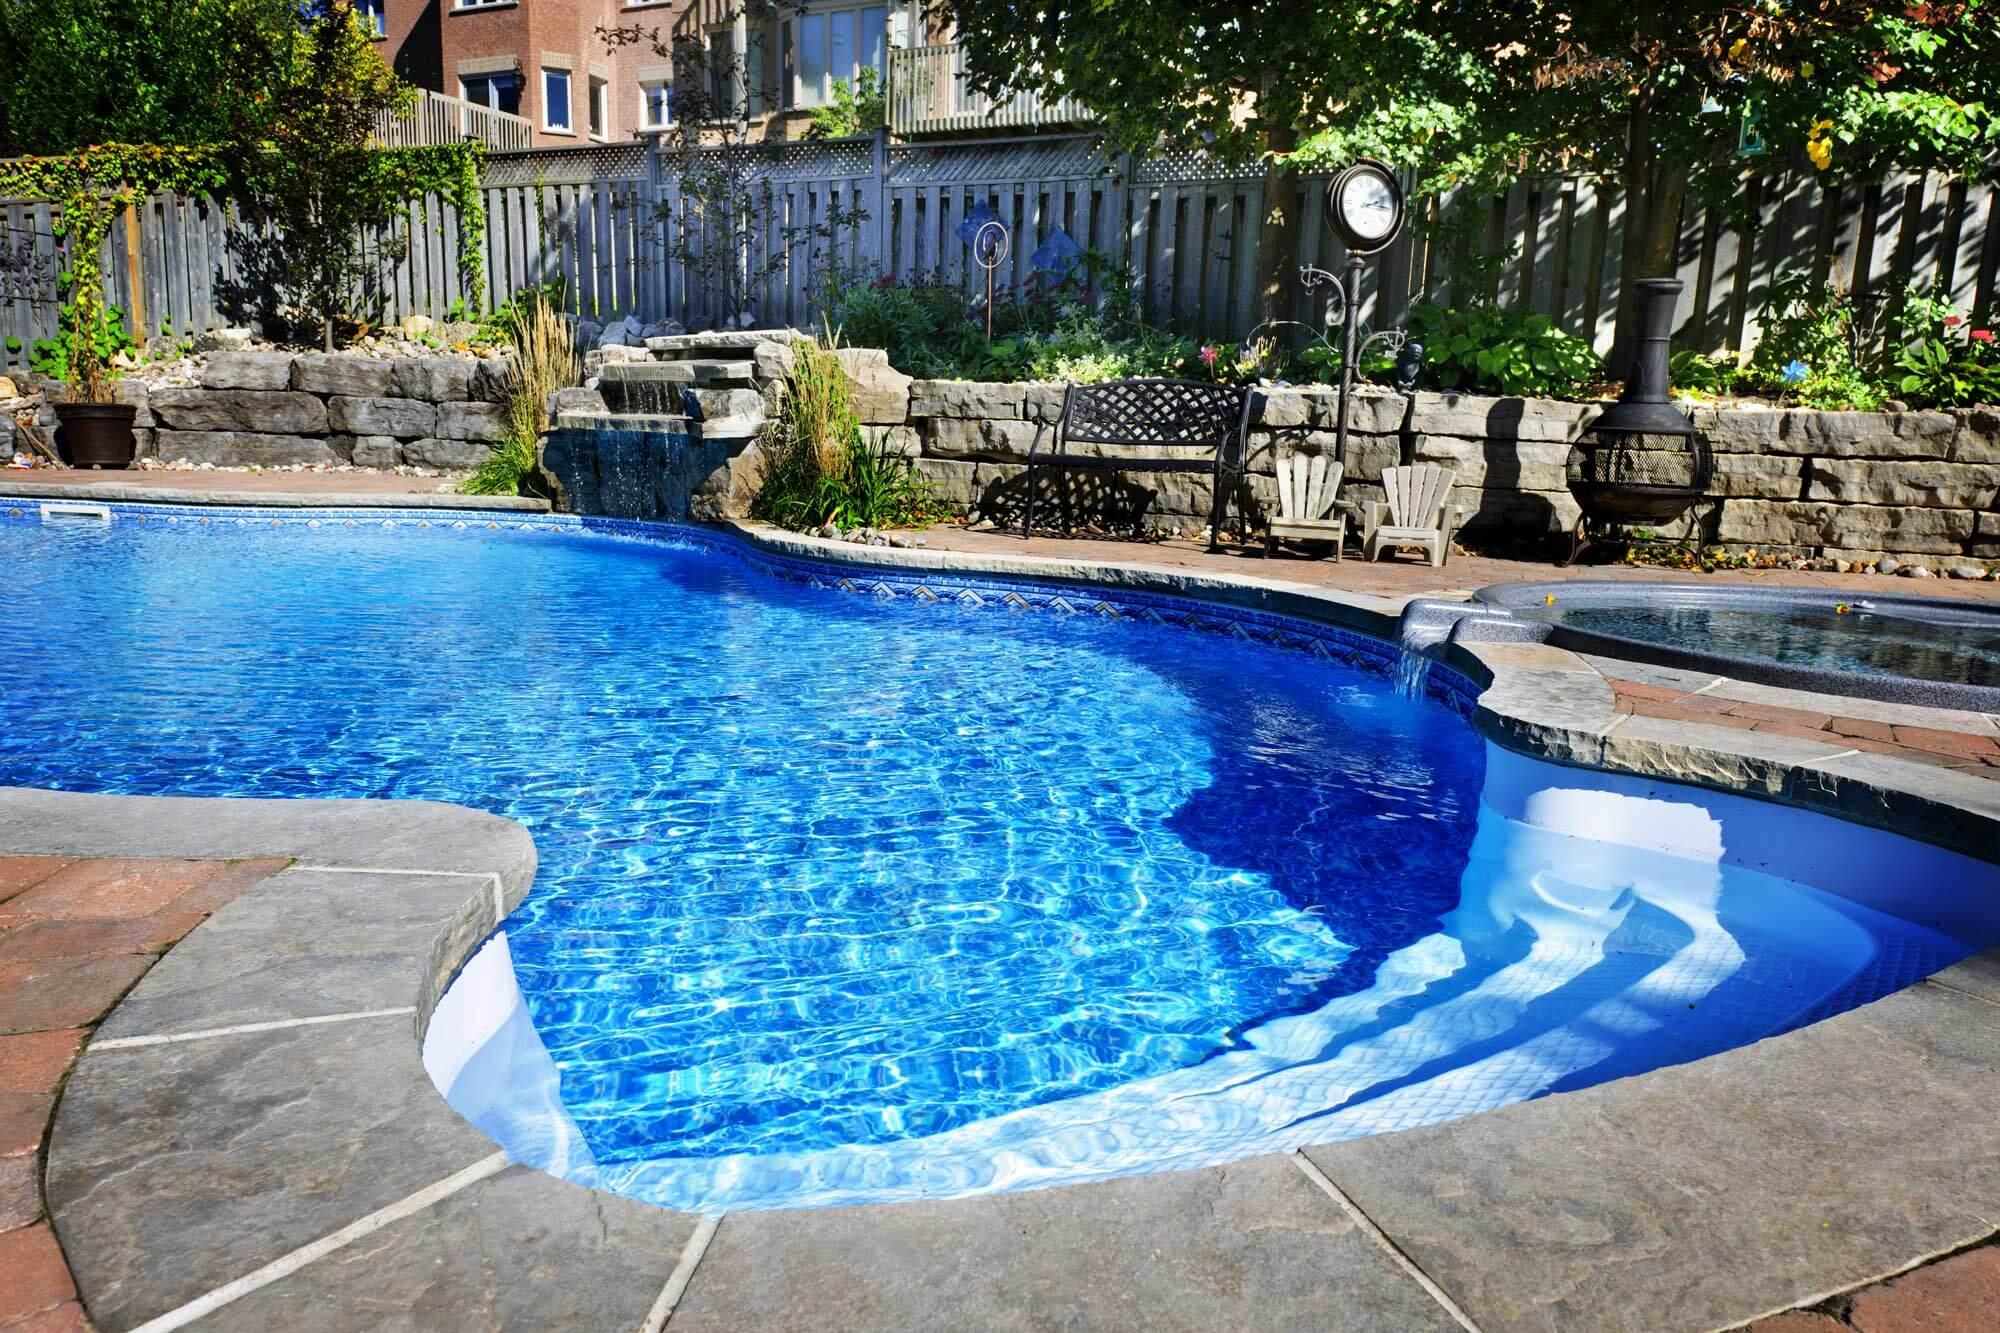 Diversified Swimming Pool & Retail Operation